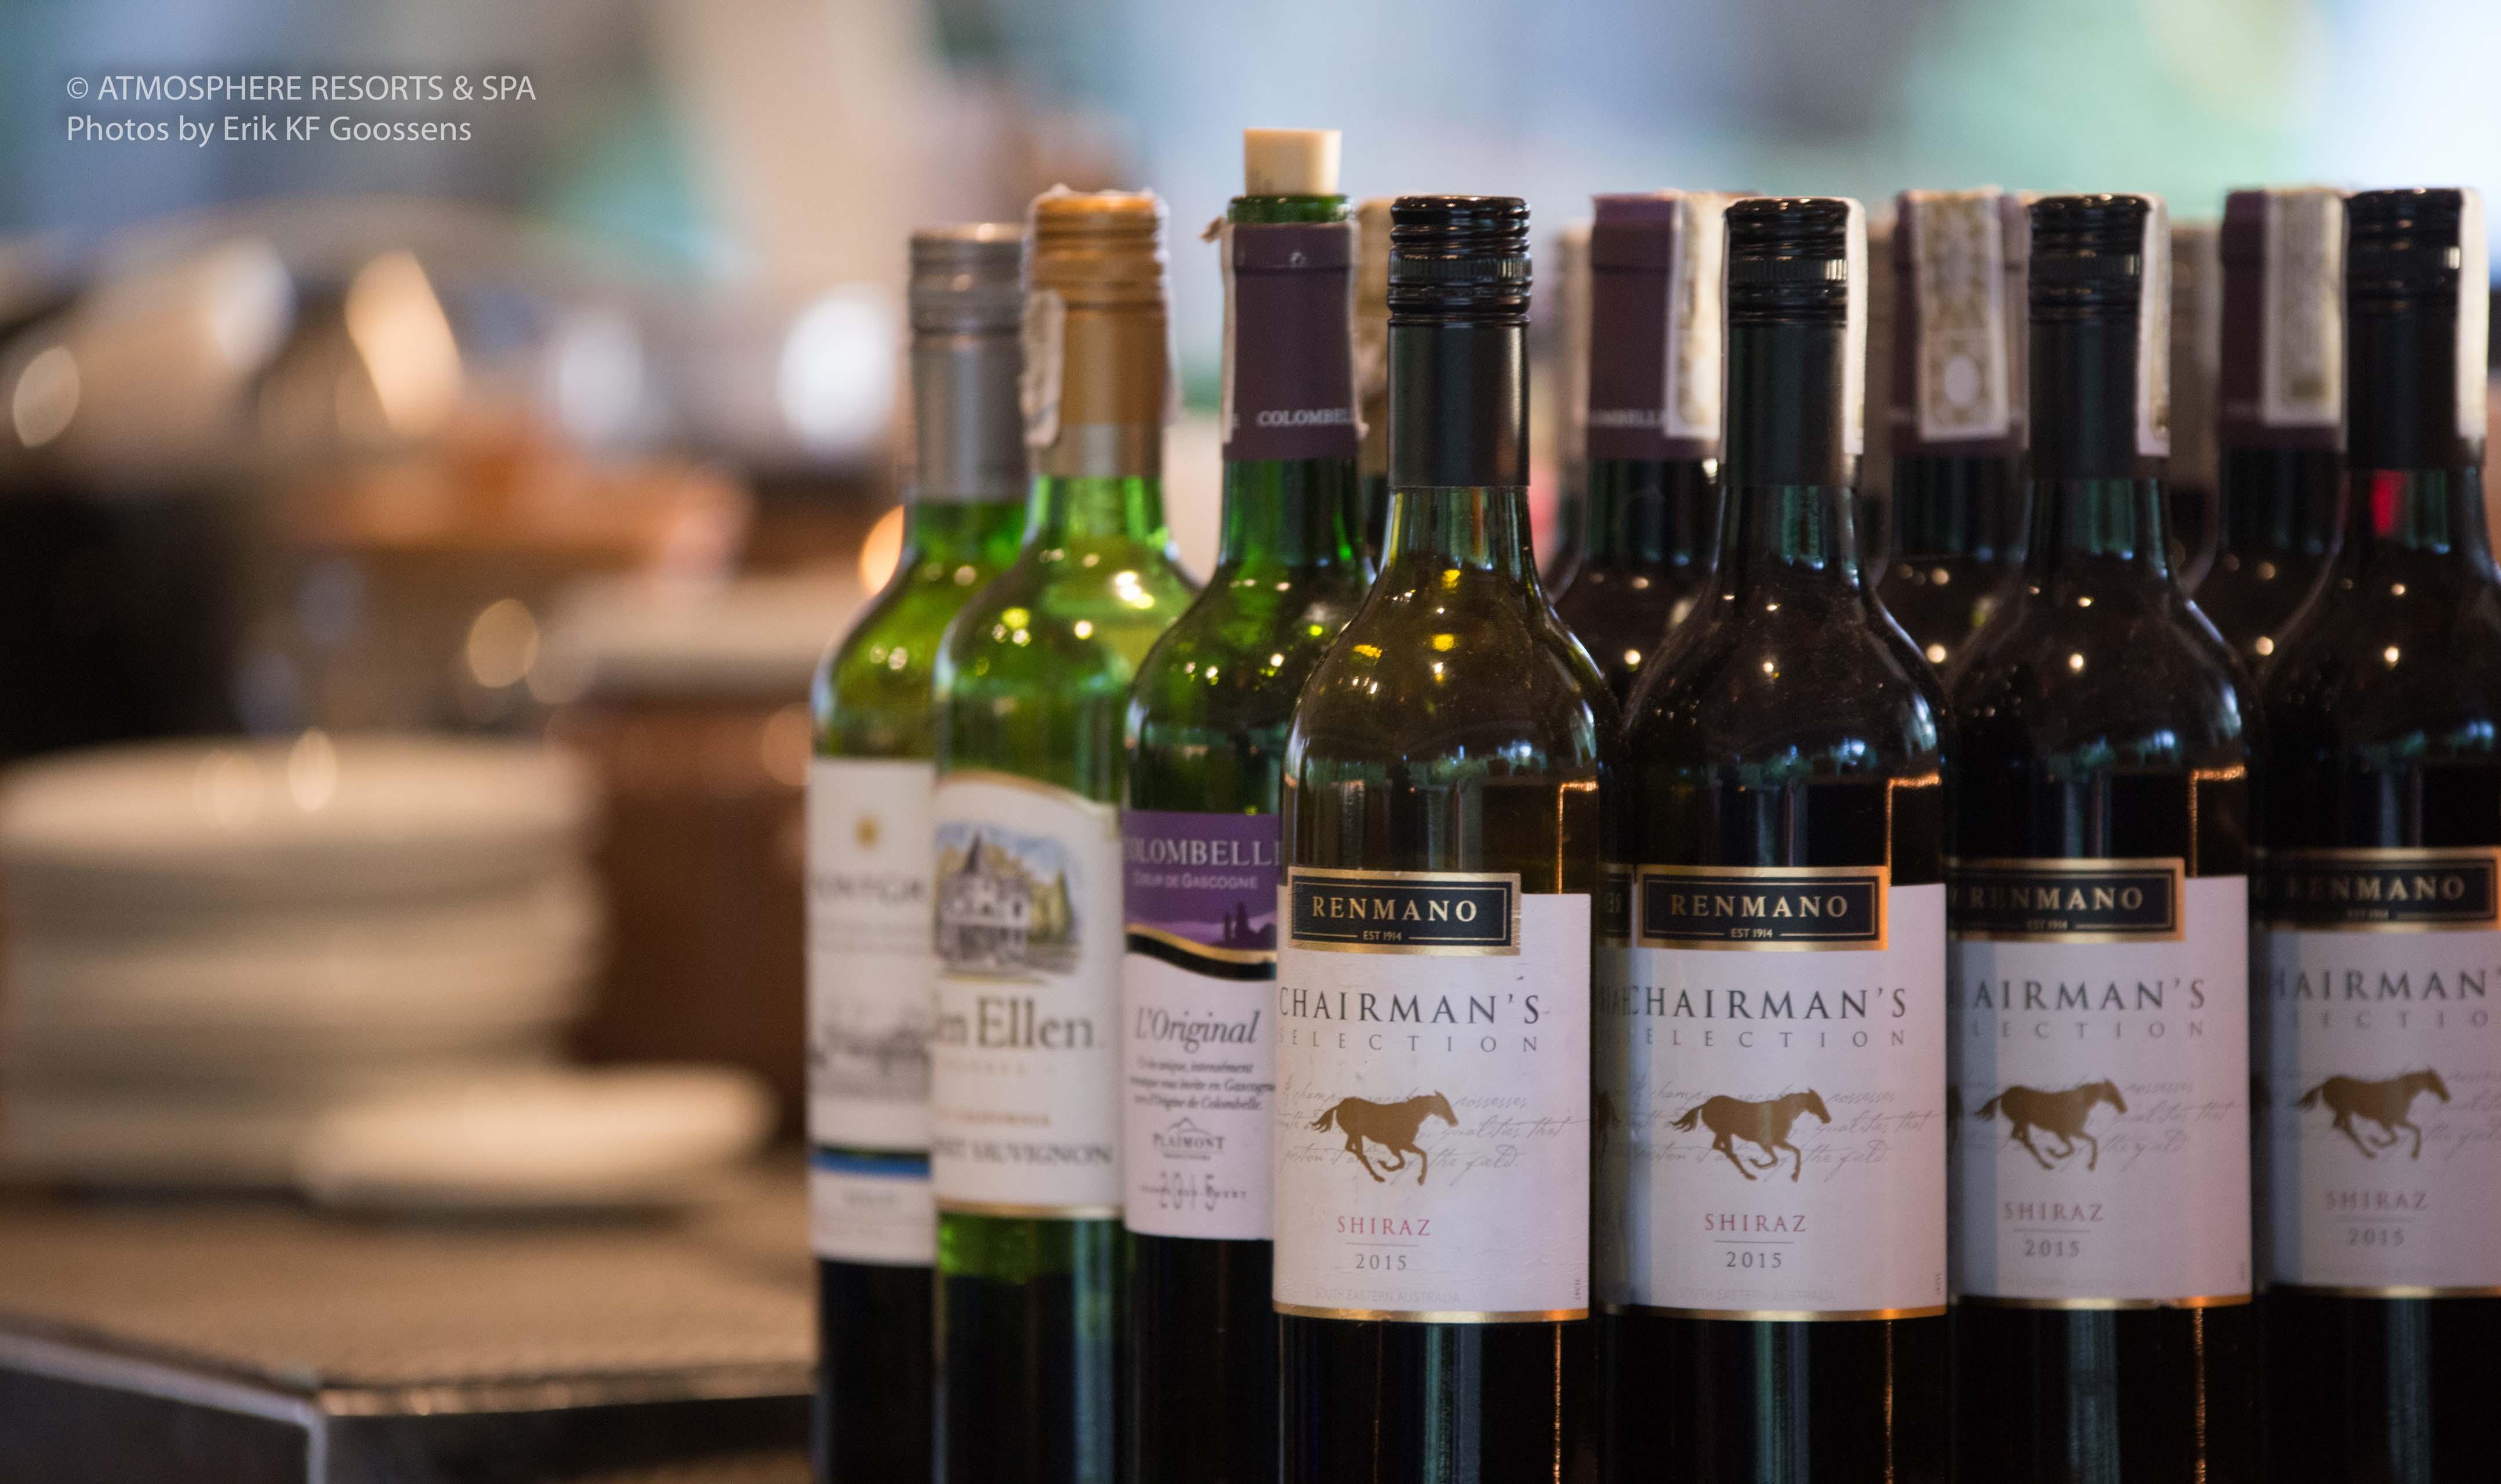 Wine tasting Atmosphere Resorts Philippines